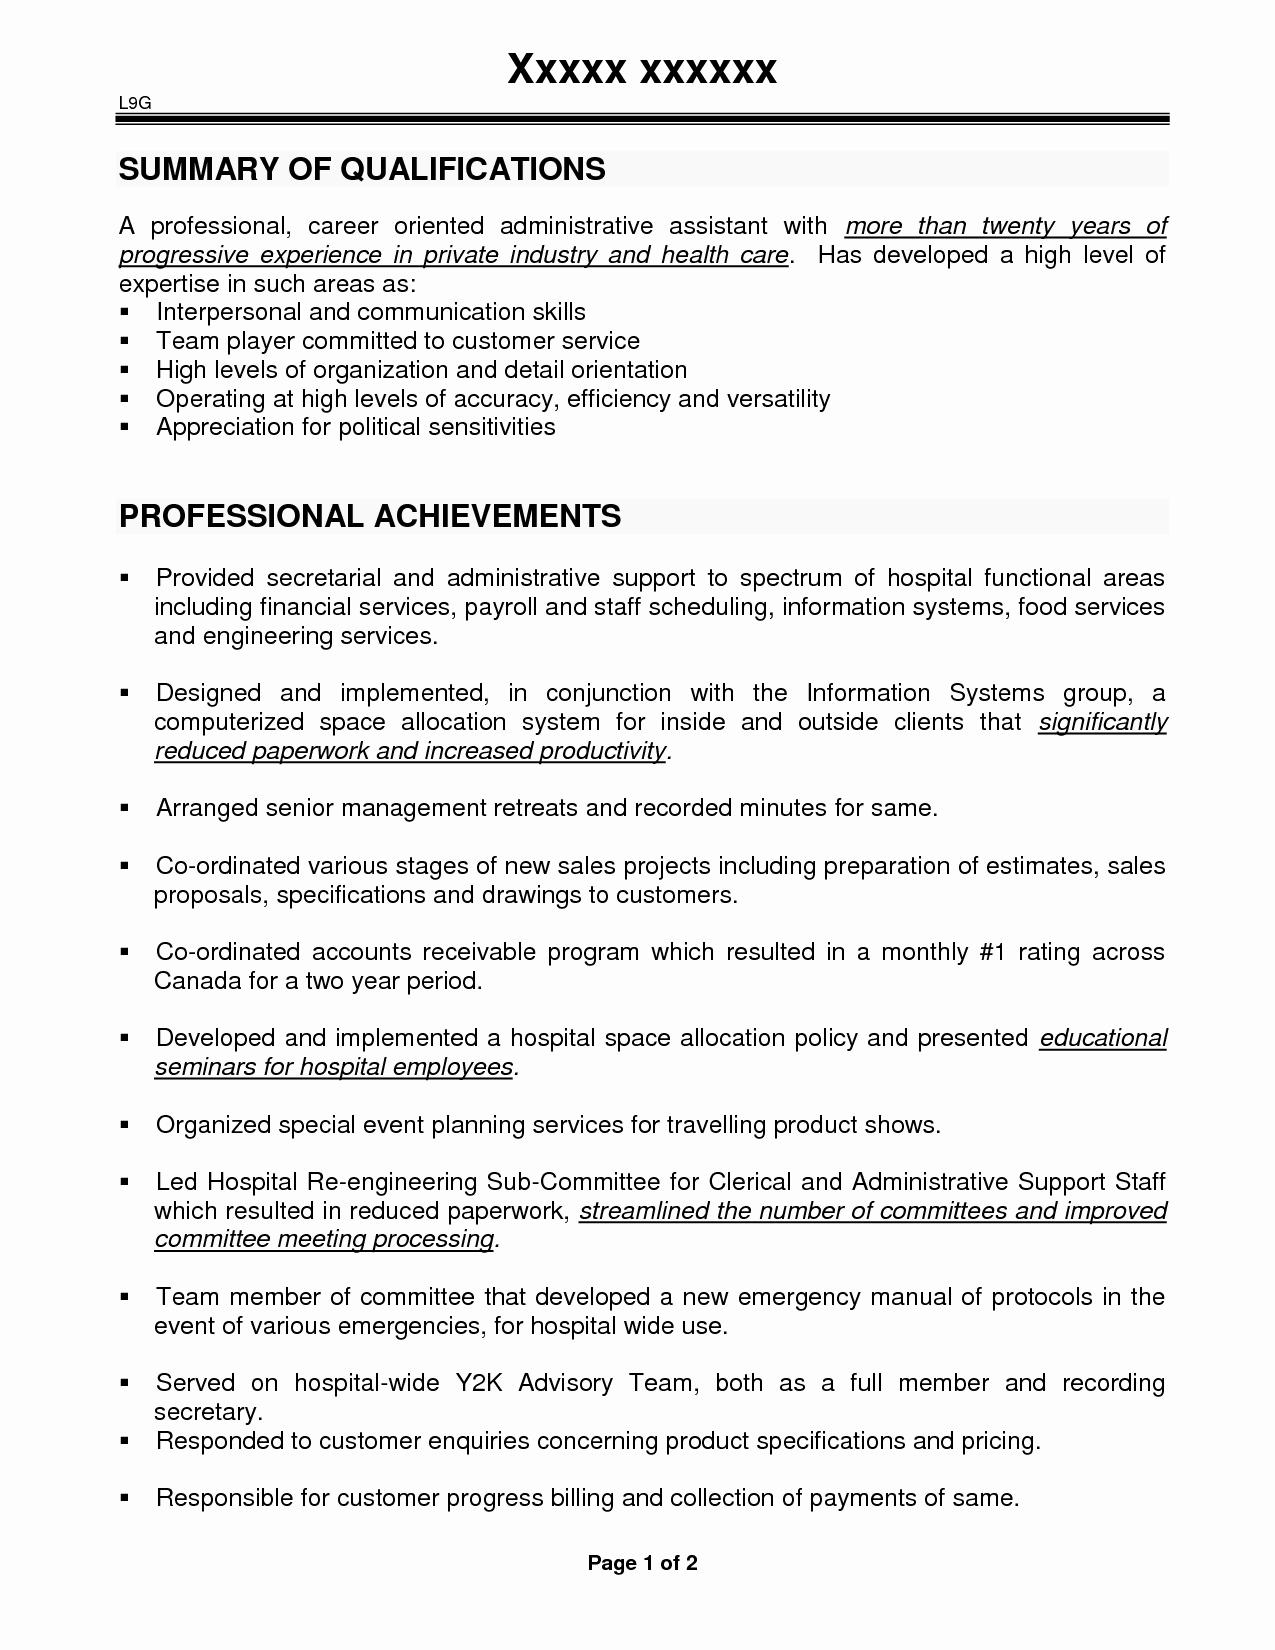 Medical assistant Resume Skills